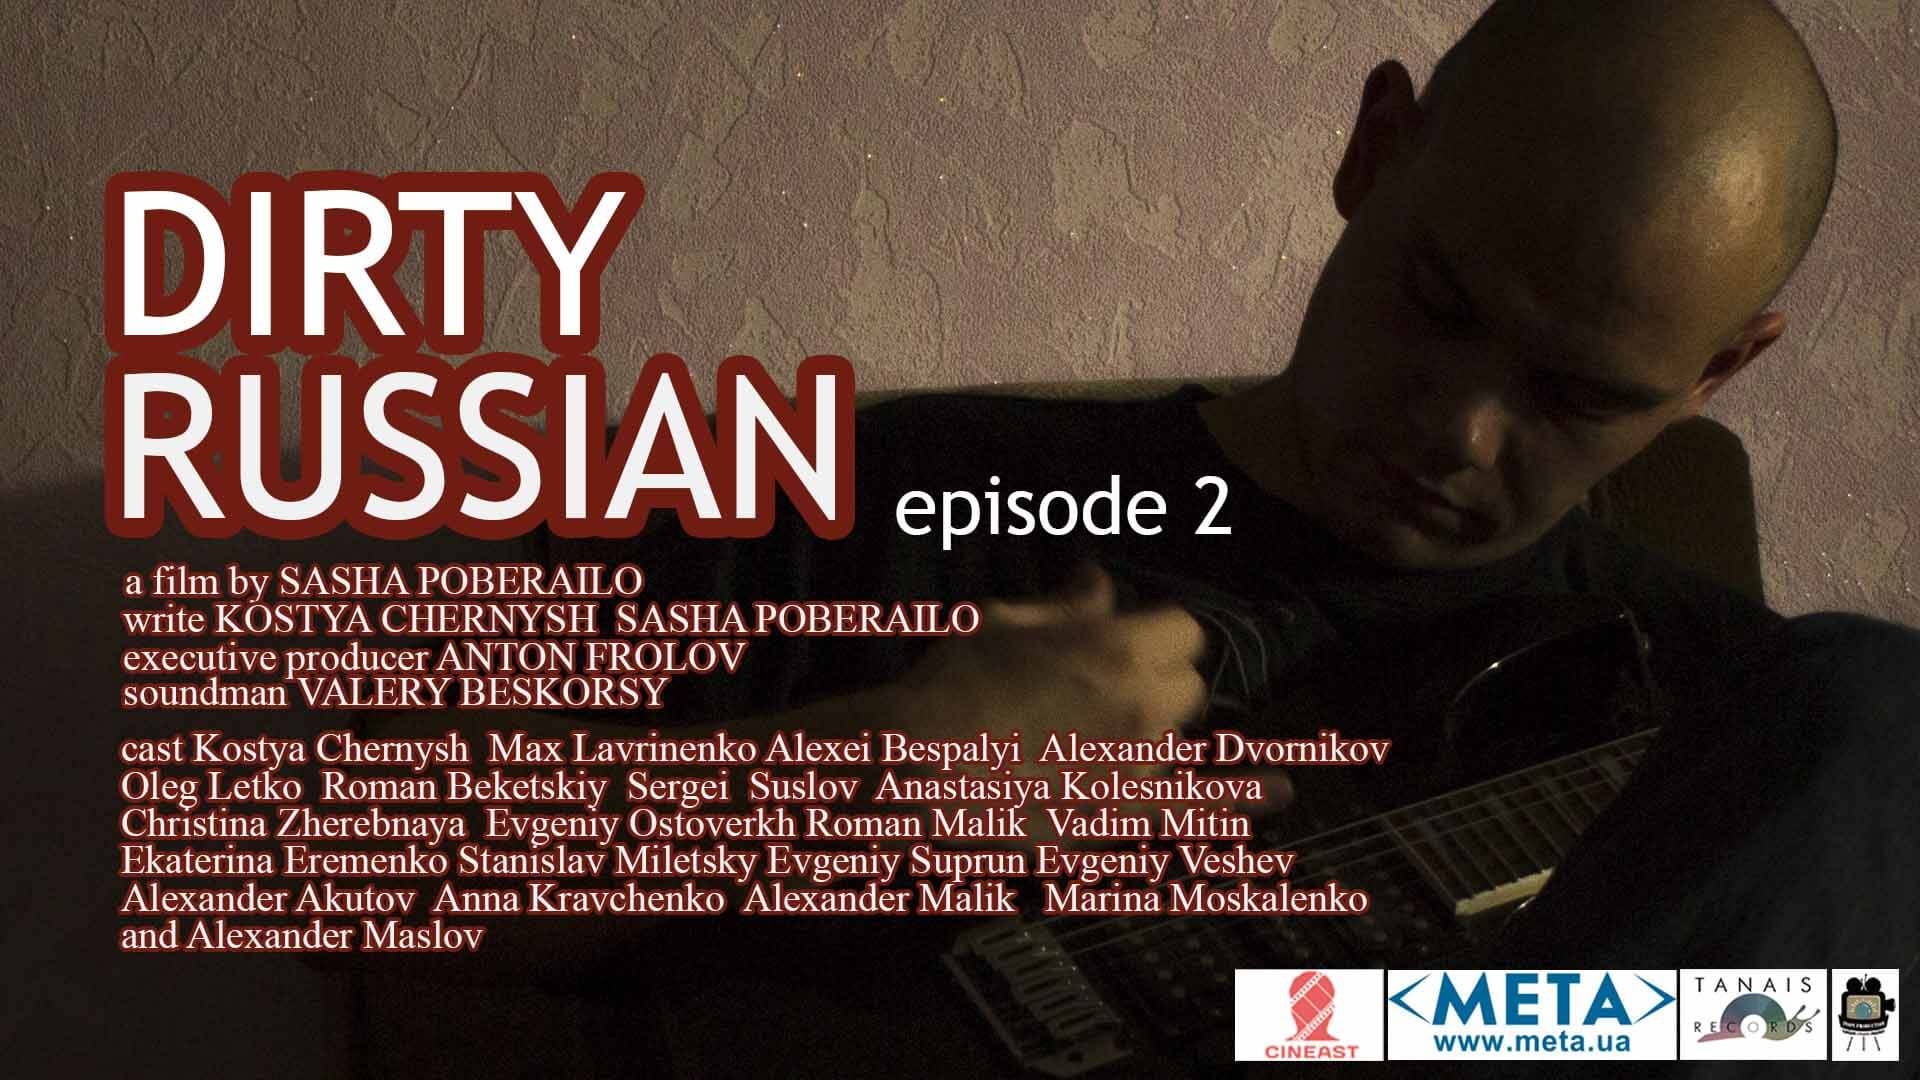 dirty russian episode 2 - Webseries